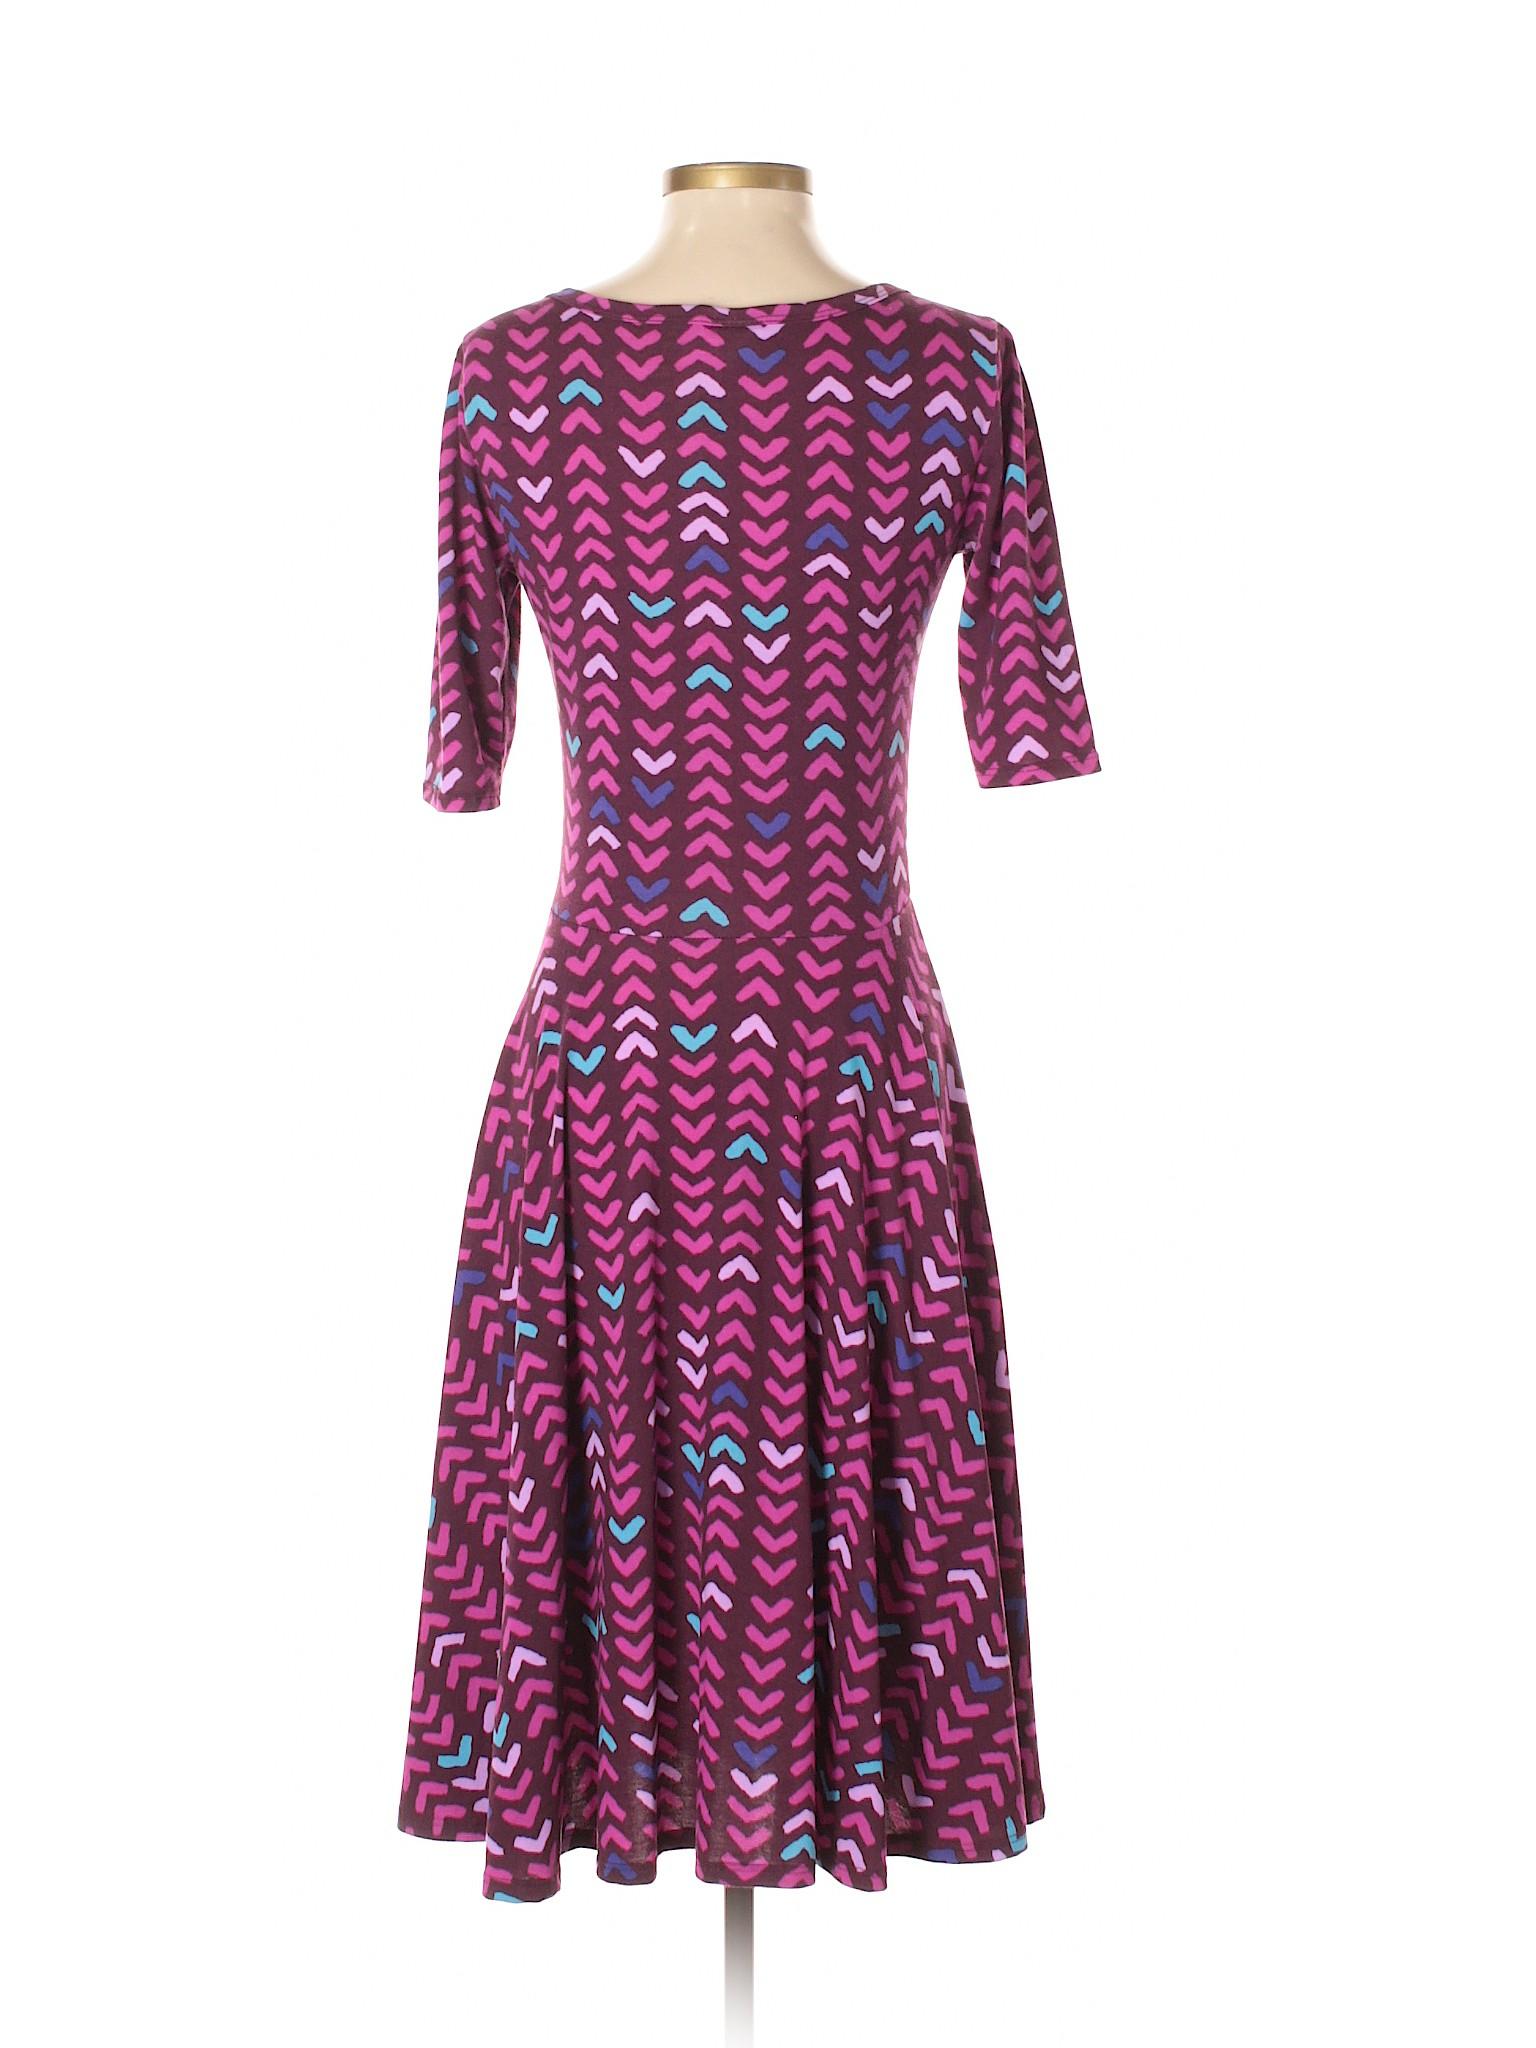 Lularoe Boutique Casual Dress Lularoe Boutique Dress Casual winter winter RwOTw